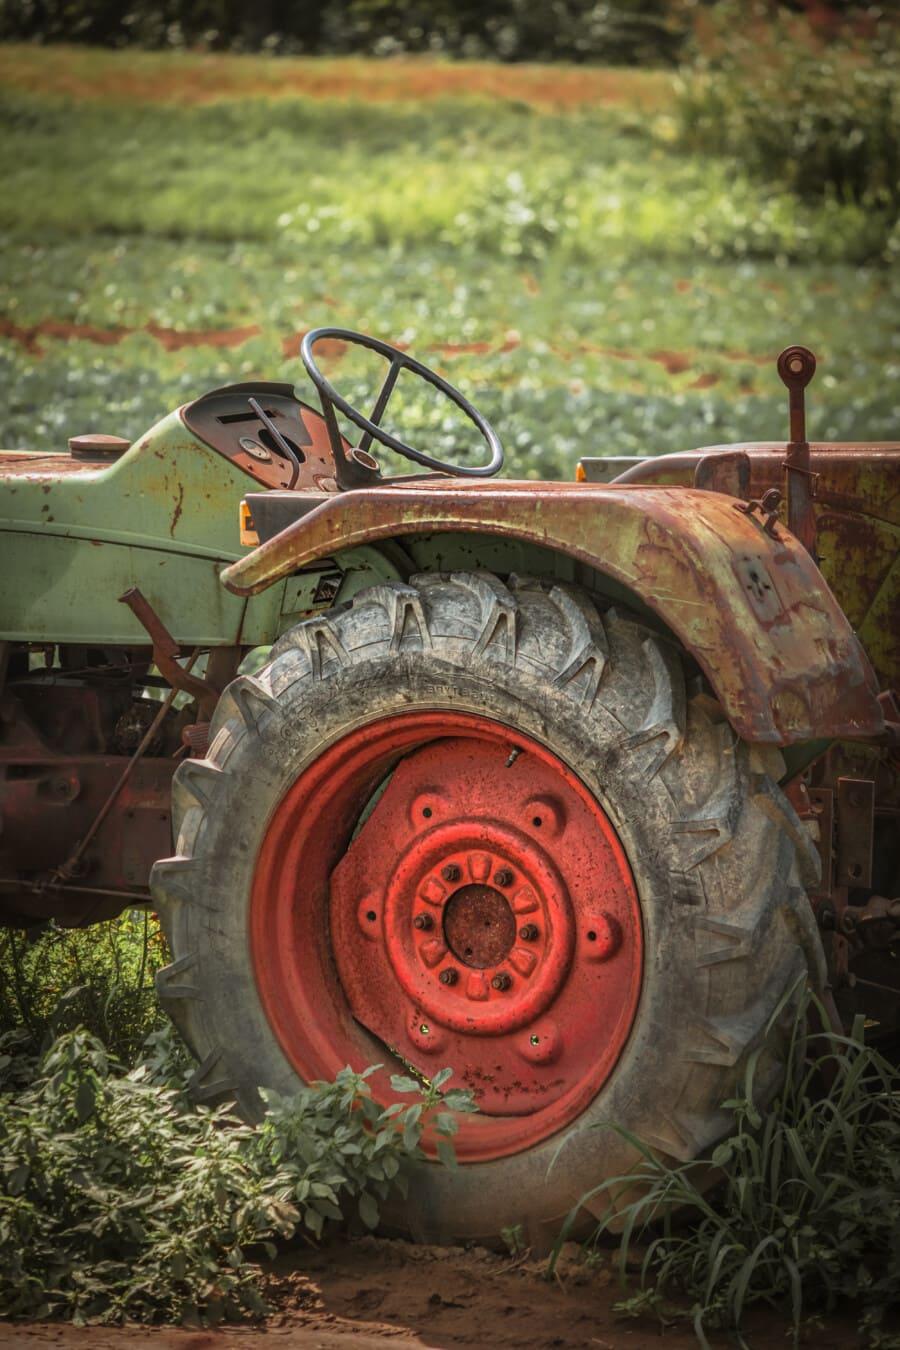 old, rust, tractor, farmland, tire, machine, device, wheel, farm, agriculture